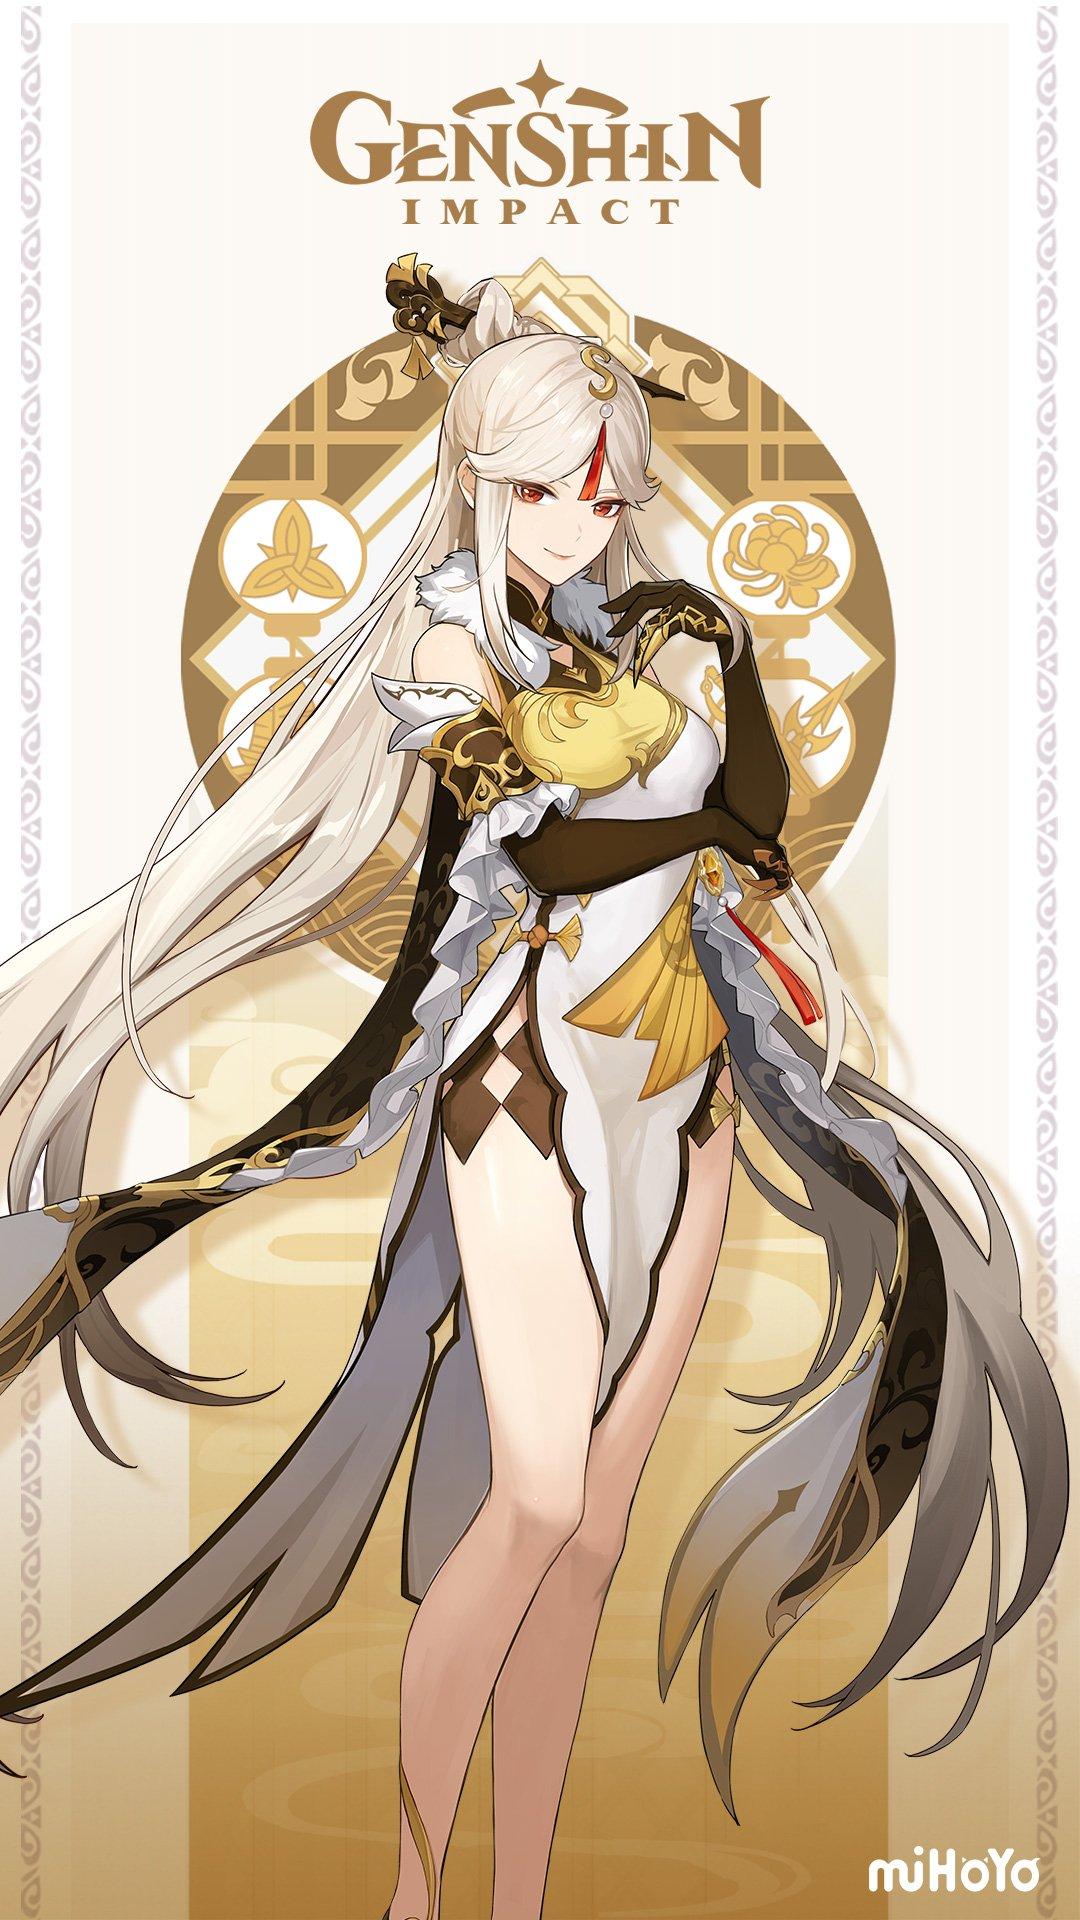 Genshin Impact Character Weapons